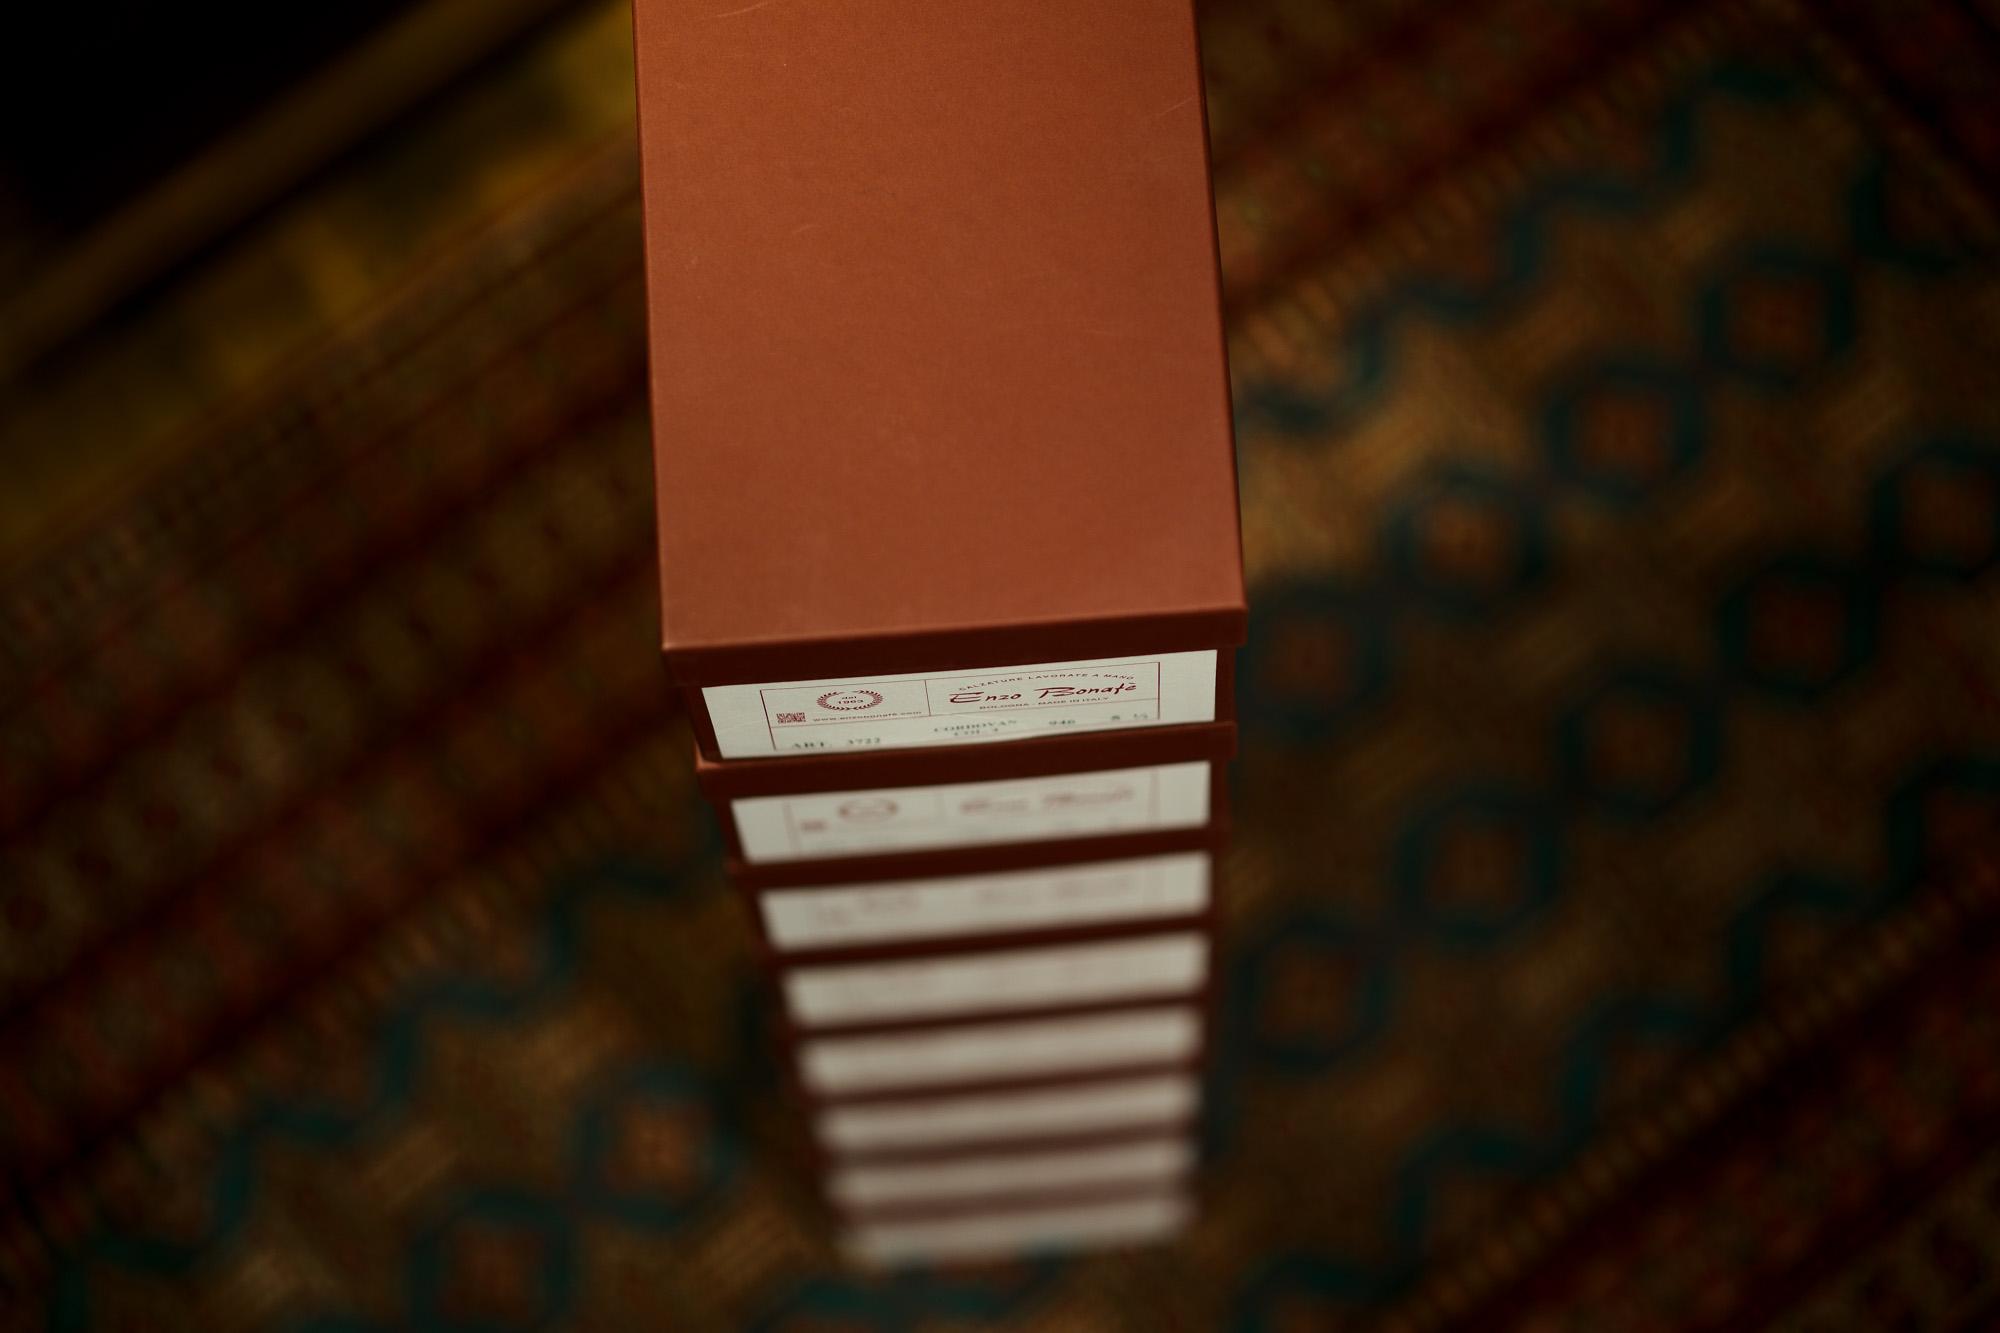 ENZO BONAFE(エンツォボナフェ) ART.3722 Chukka boots チャッカブーツ Horween Shell Cordovan Leather ホーウィン社 シェルコードバンレザー ノルベジェーゼ製法 チャッカブーツ コードバンブーツ No.4(#4)  made in italy (イタリア製) 2019 春夏新作 enzobonafe 愛知 名古屋 altoediritto アルトエデリット